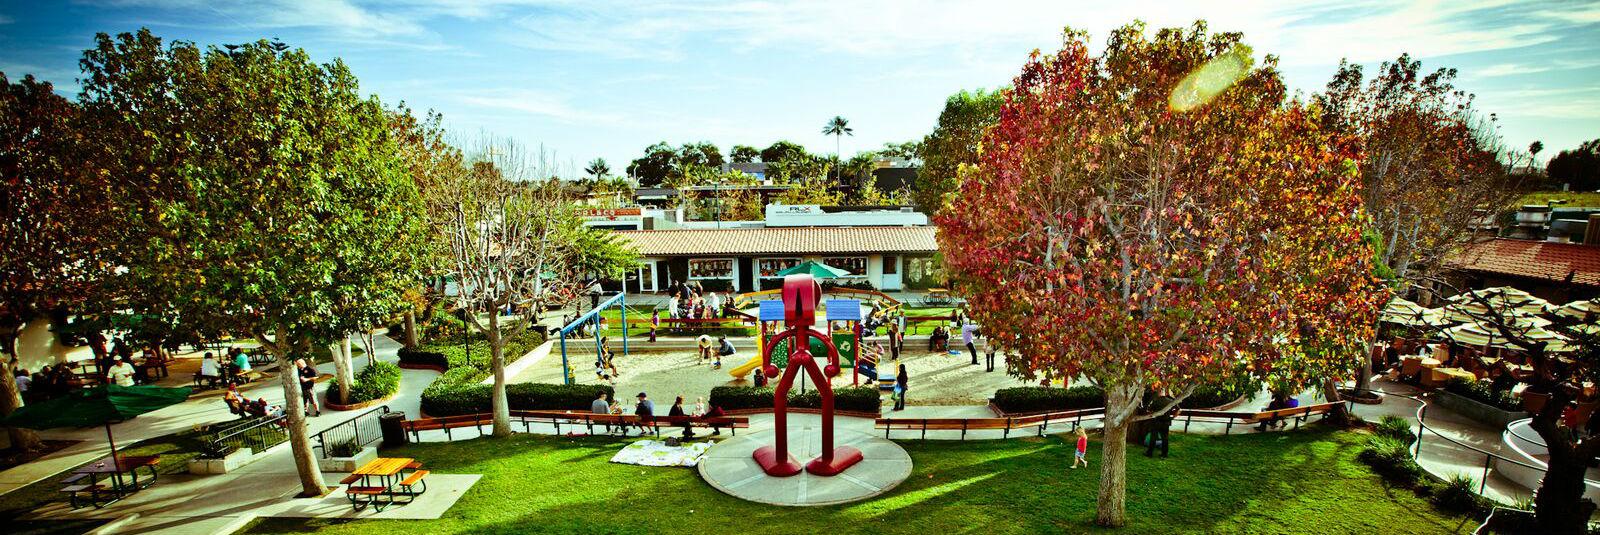 Countrymart-playground-aerial-fantasy1.jpg